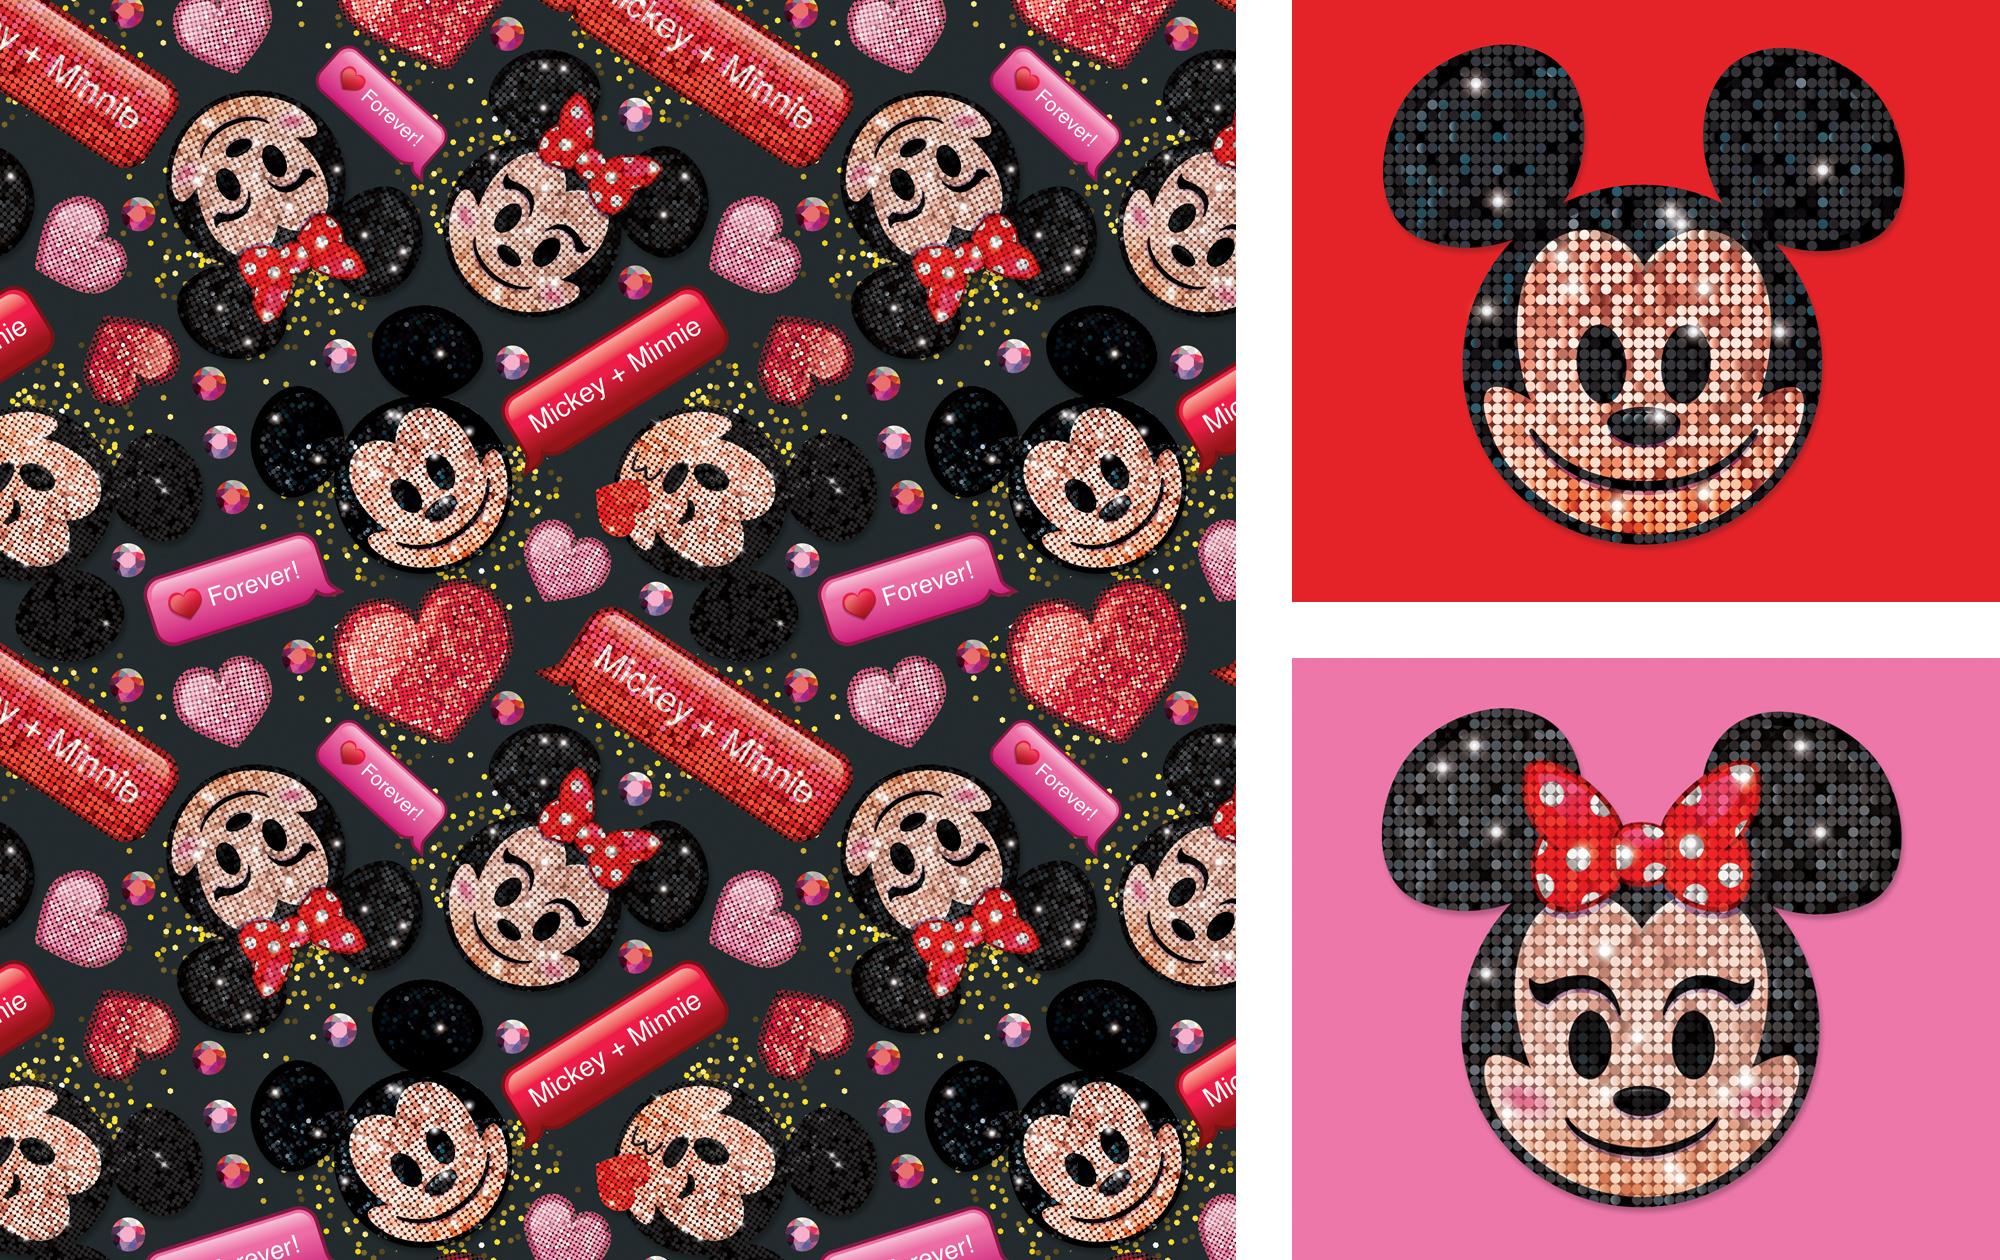 Disney mattson 03